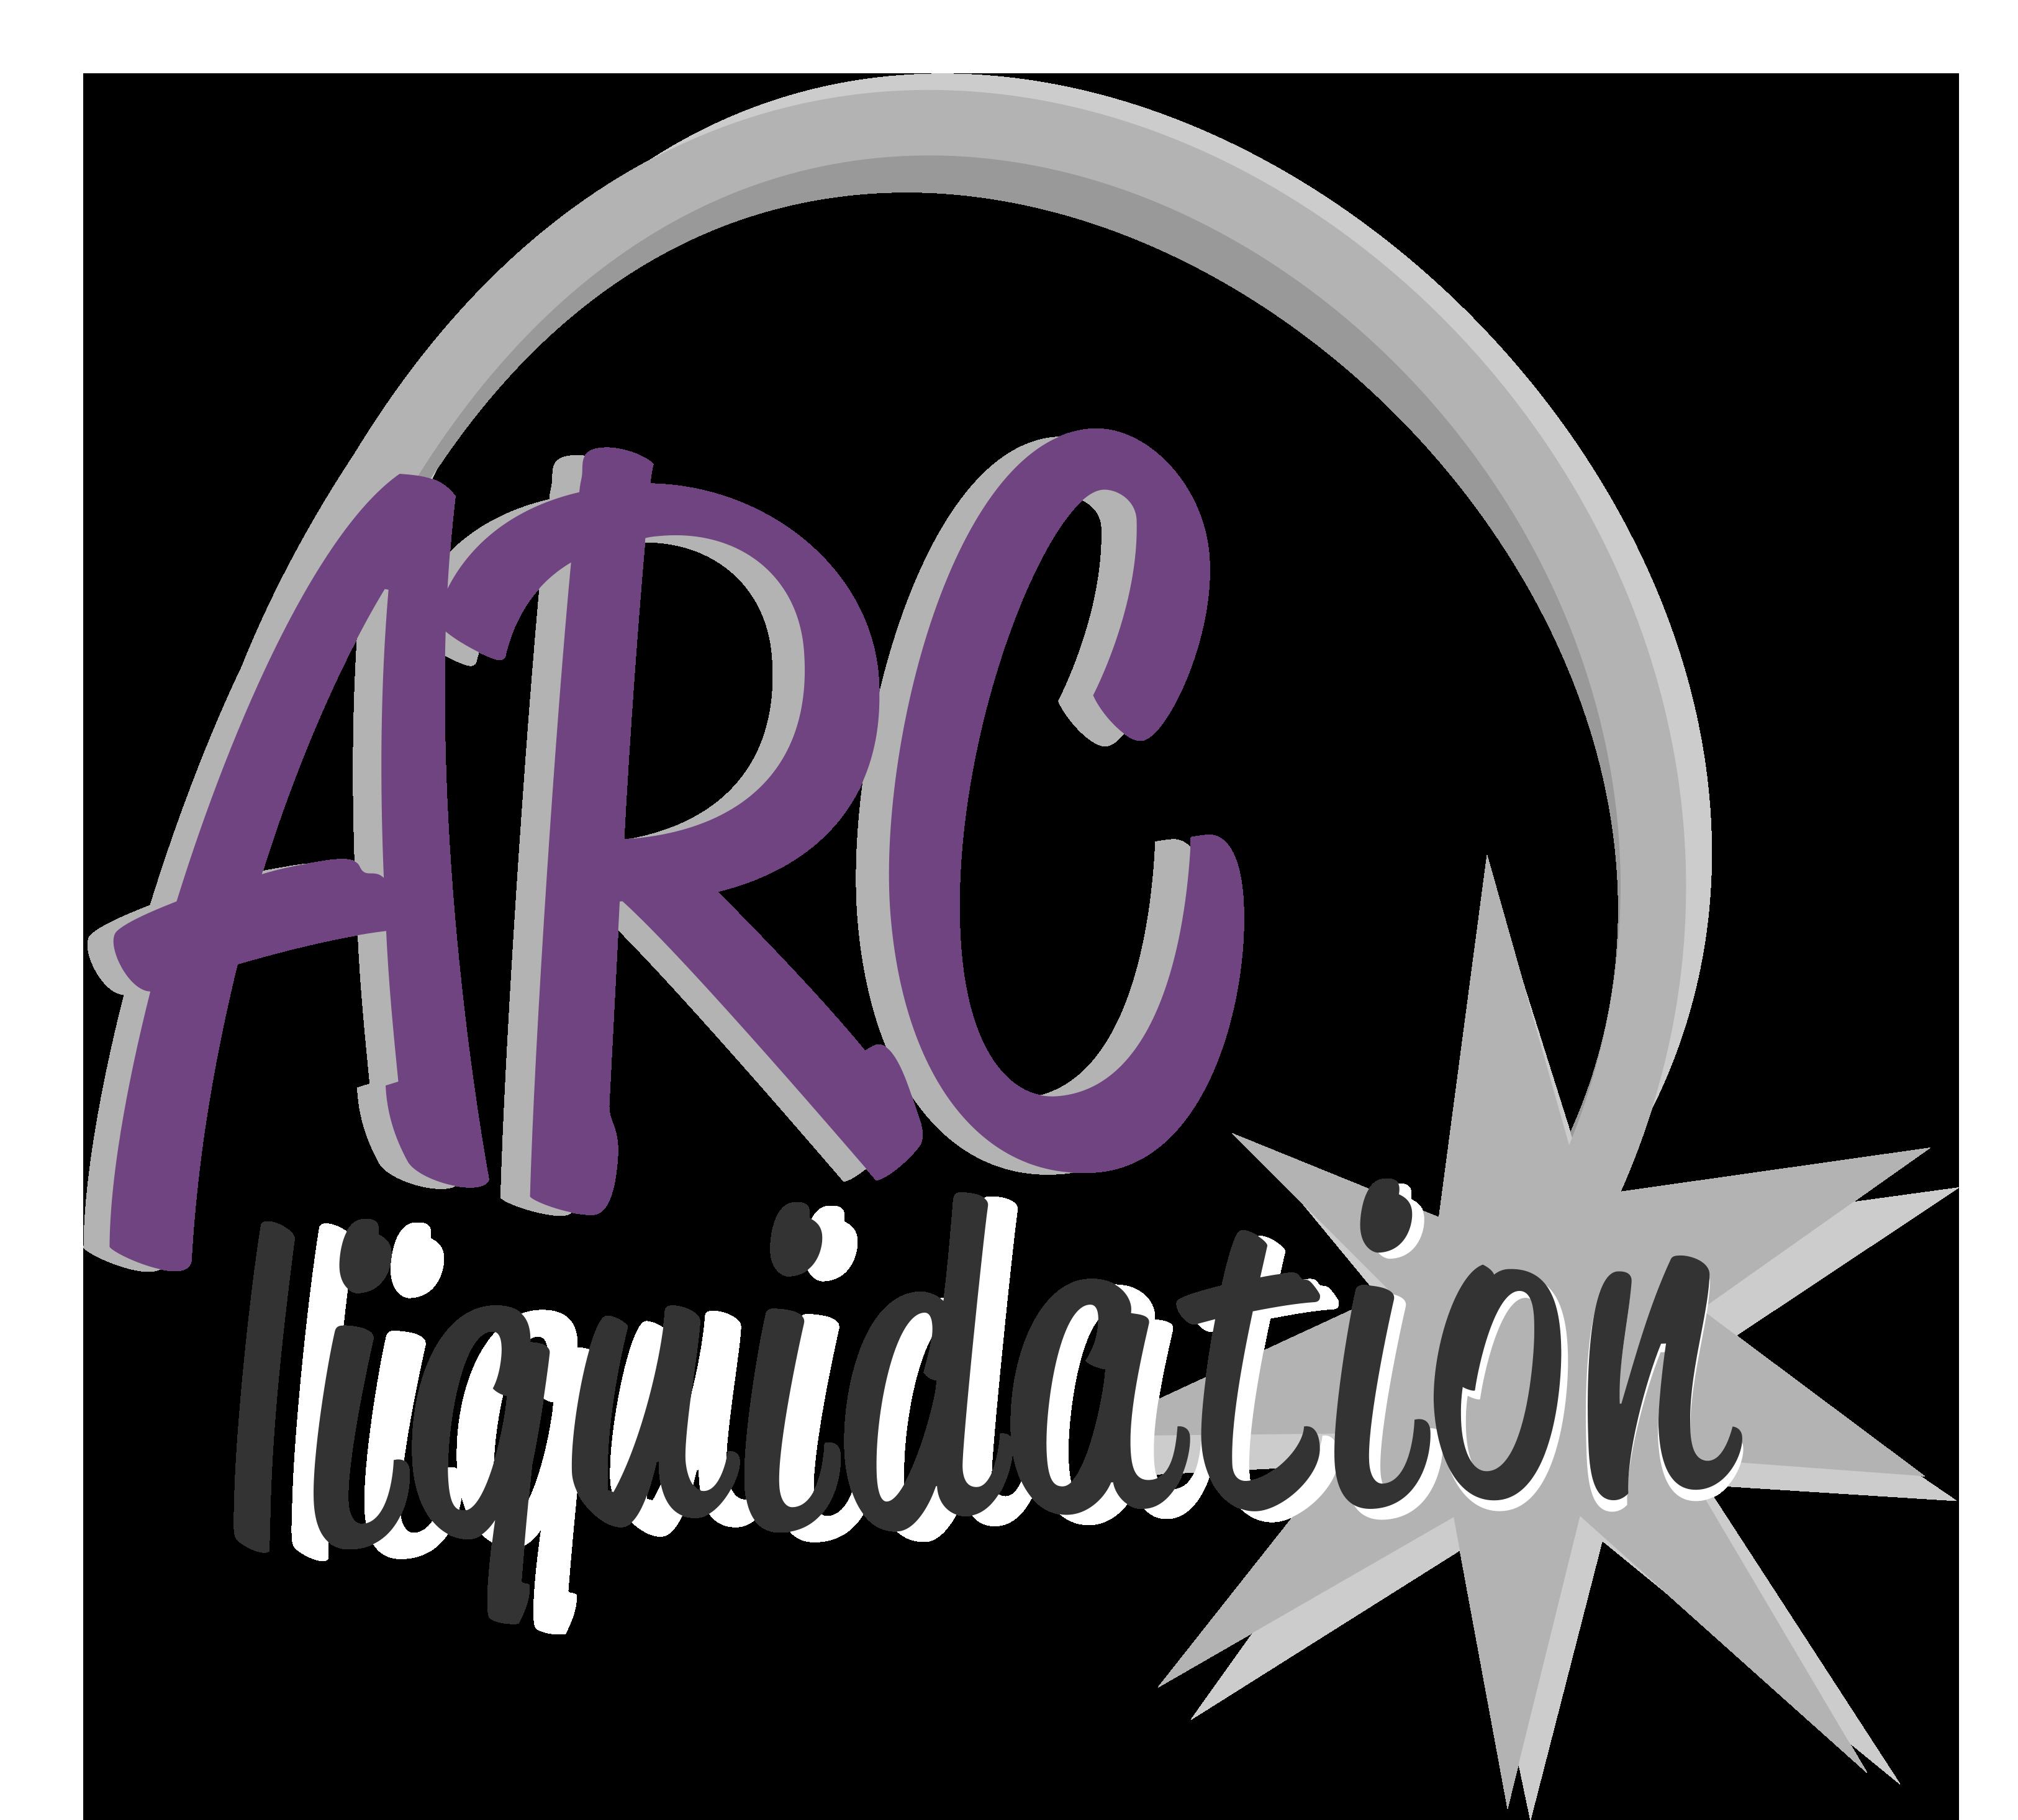 Arc Liquidation Group